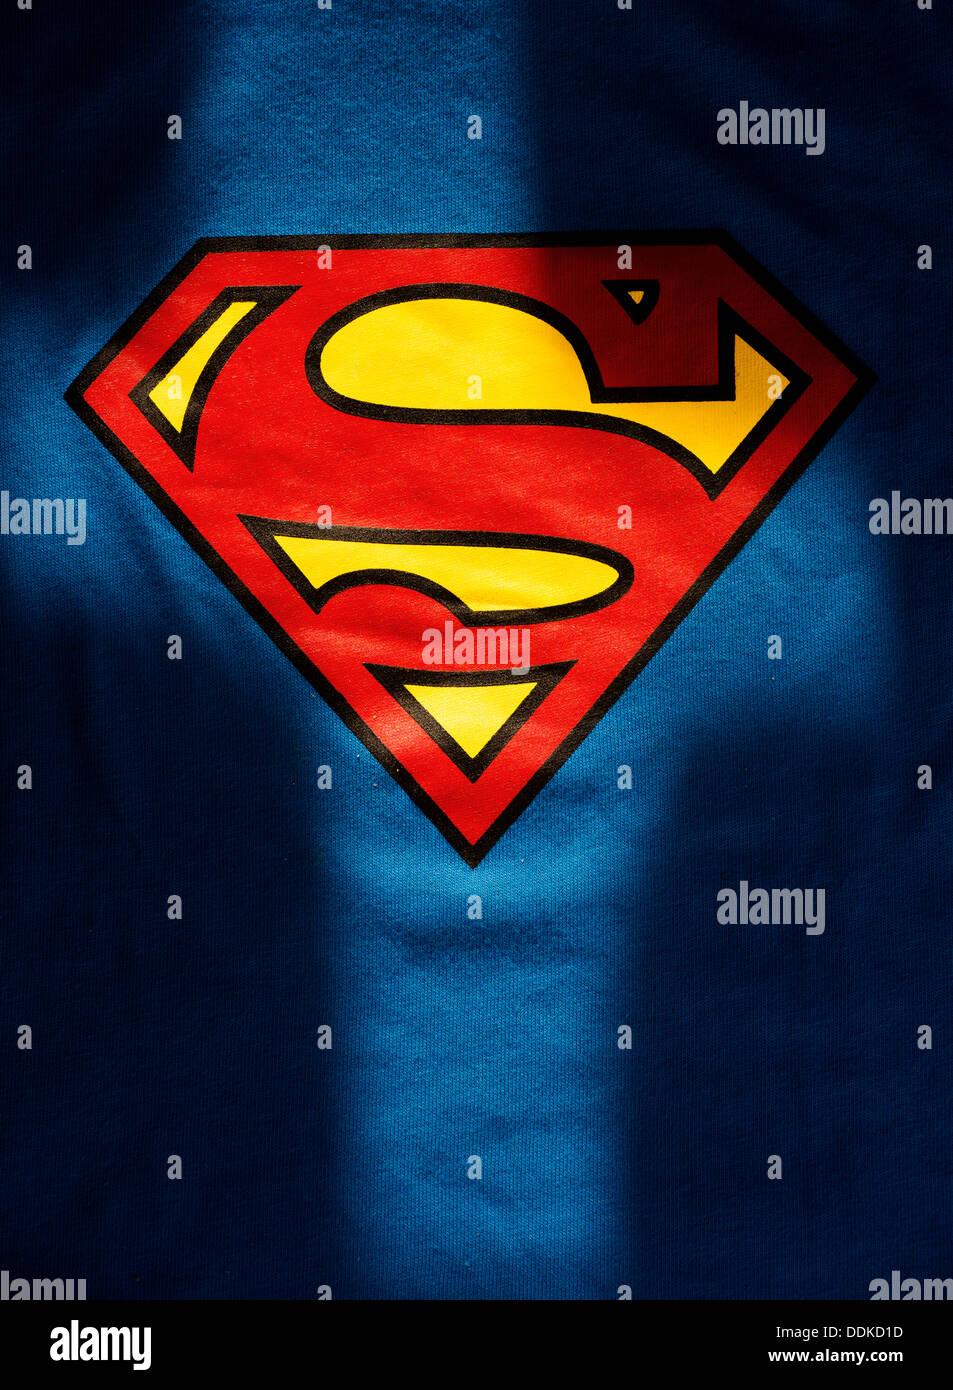 7d8aded1 Superman Logo Stock Photos & Superman Logo Stock Images - Alamy